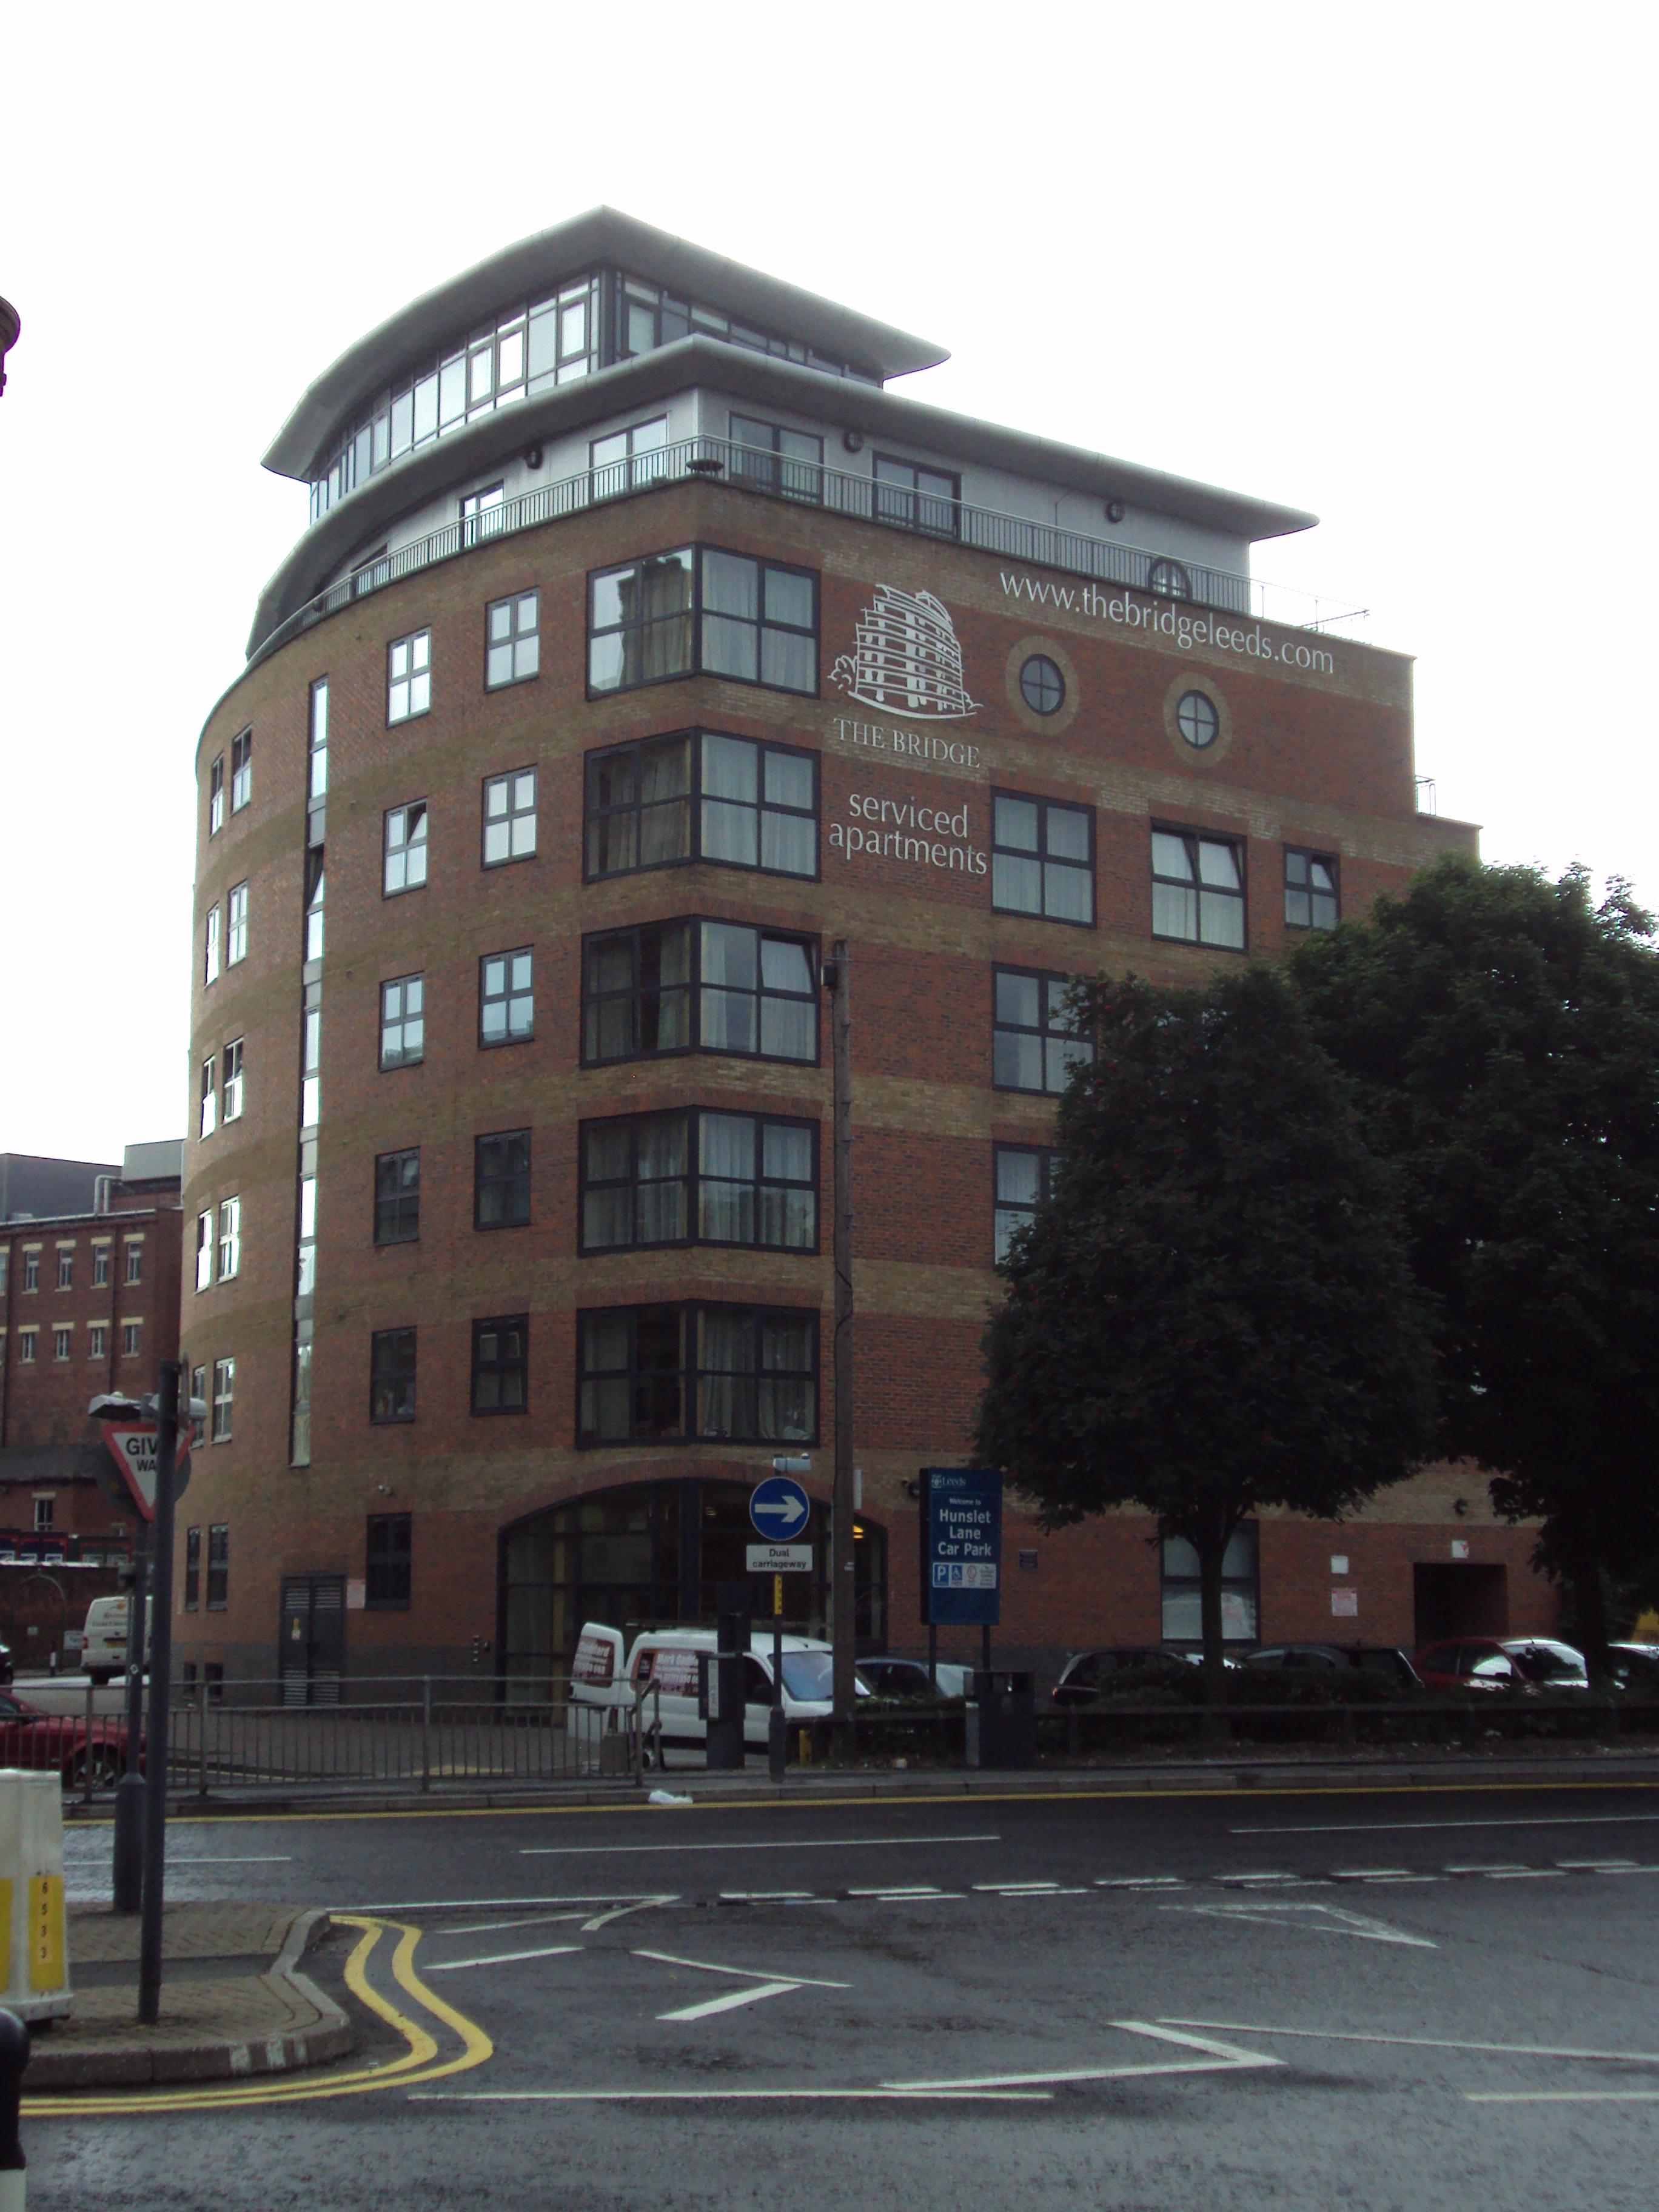 File:The Bridge, Serviced Apartments, Leeds   DSC07534.JPG